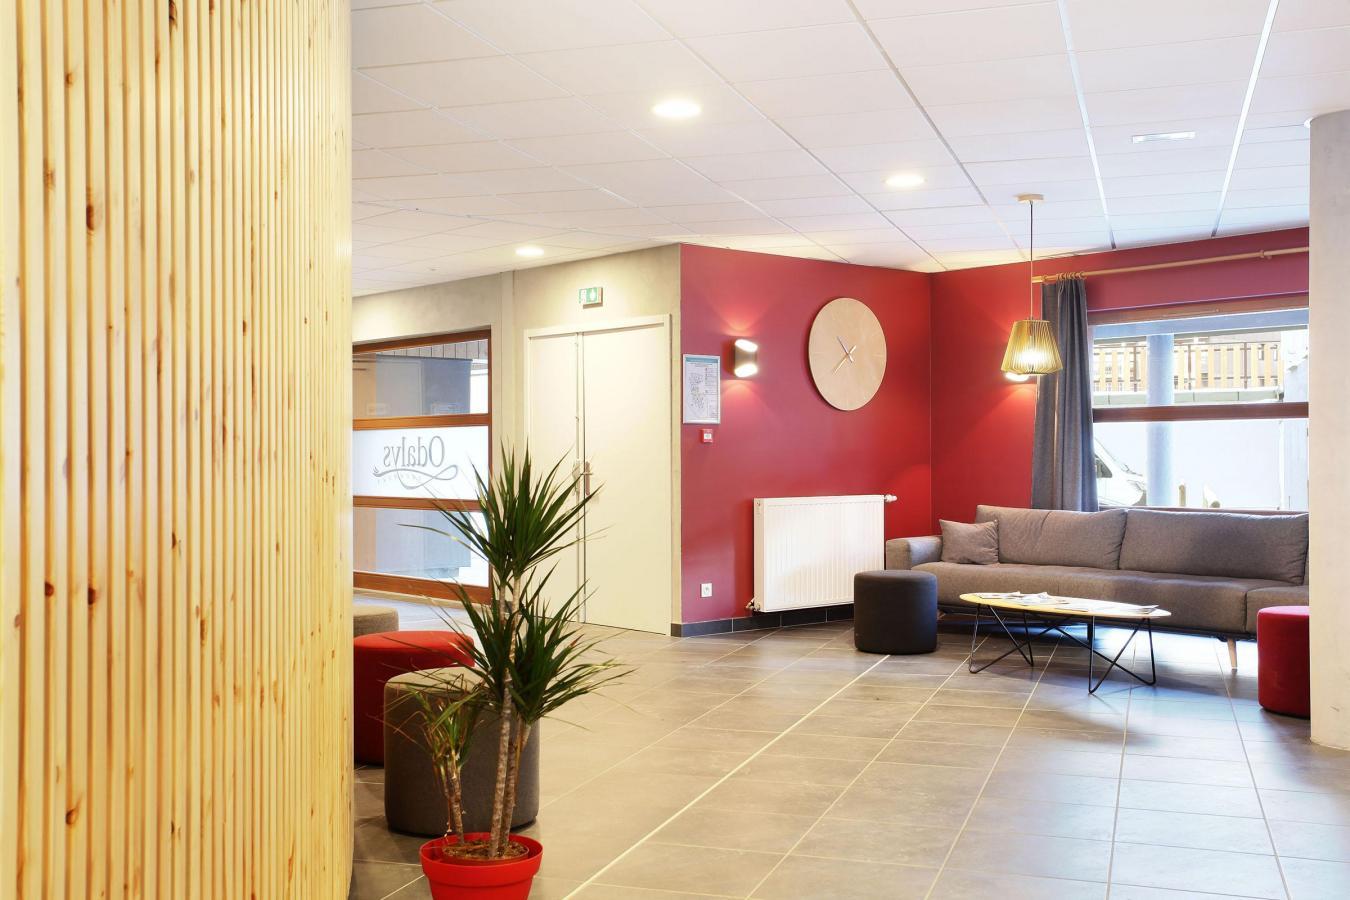 residence aquisana serre chevalier location vacances ski serre chevalier ski planet. Black Bedroom Furniture Sets. Home Design Ideas